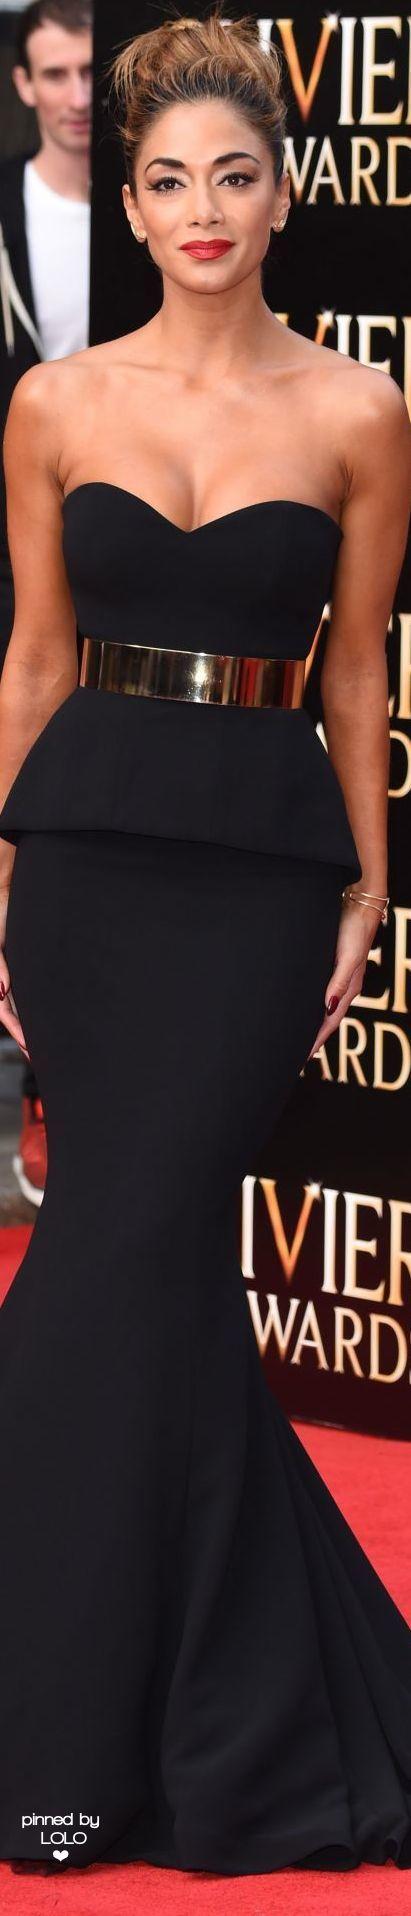 Nicole Scherzinger in a black strapless Galia Lahav gown with a gold metal belt.